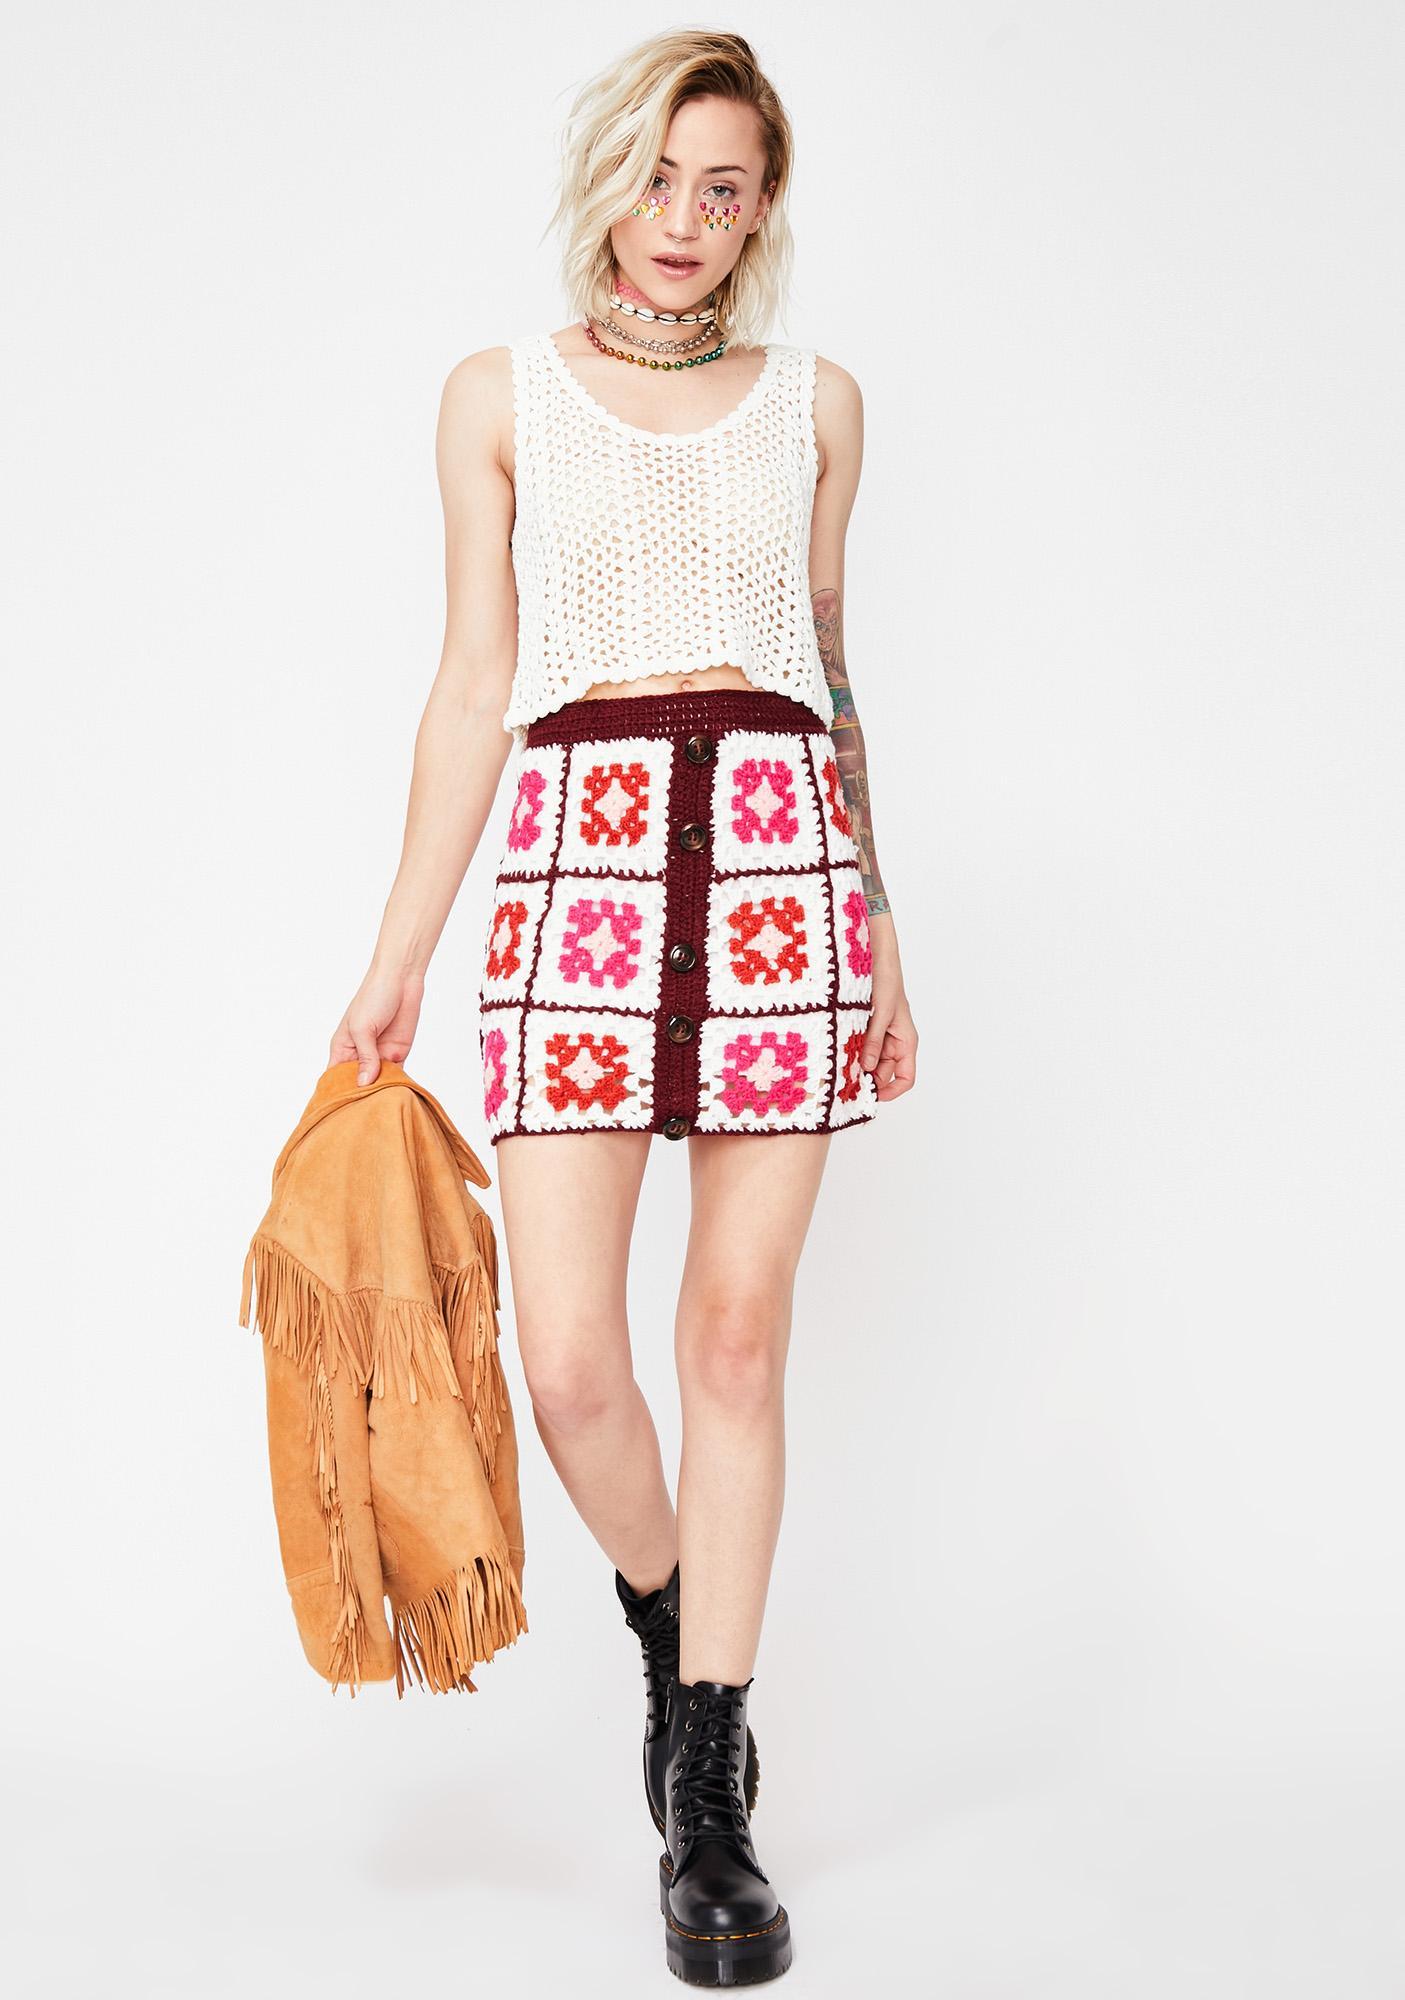 Arts N' Crafty Crochet Skirt